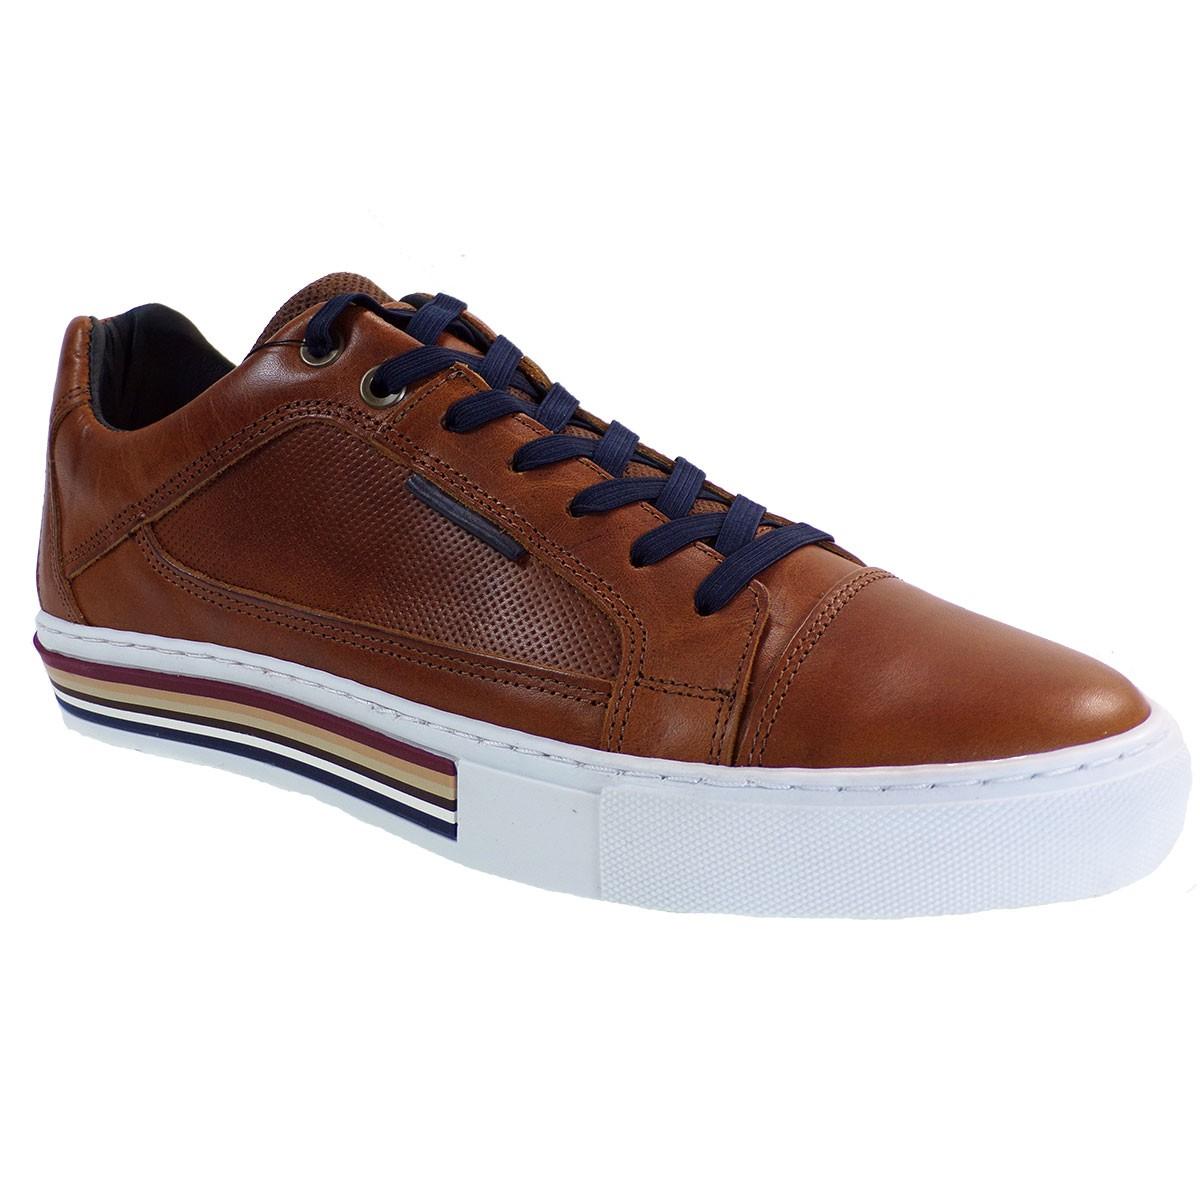 Bullboxer Ανδρικά Παπούτσια 180-428K26180B Ταμπά Δέρμα M57751802532